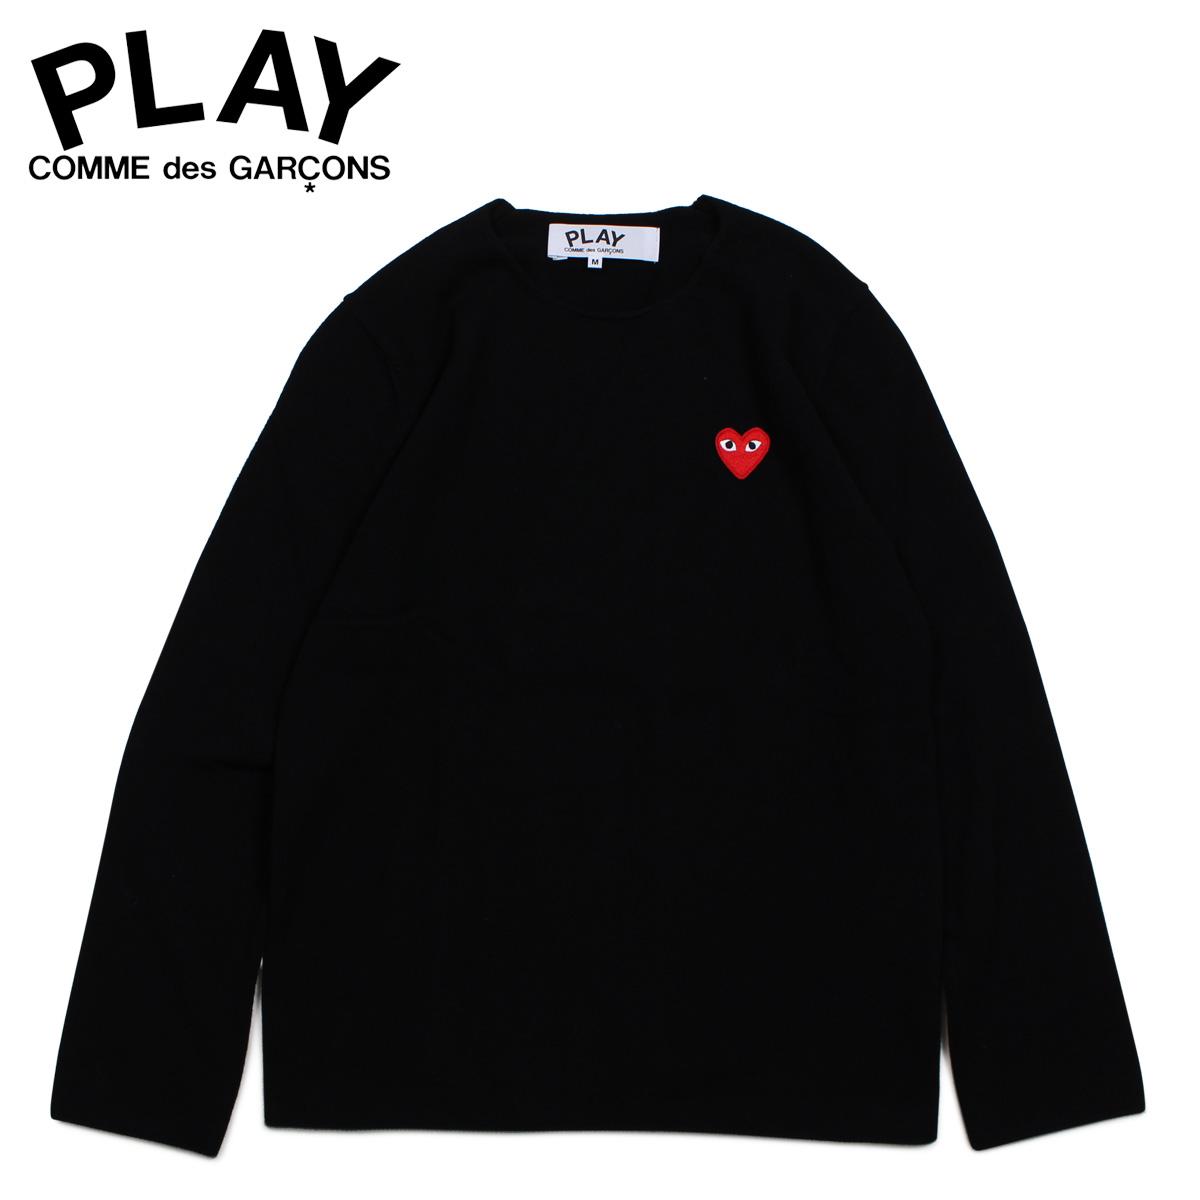 PLAY COMME des GARCONS RED HEART CREW NECK SWEATER コムデギャルソン ニット セーター メンズ ブラック 黒 AZ-N068 [4/1 新入荷]